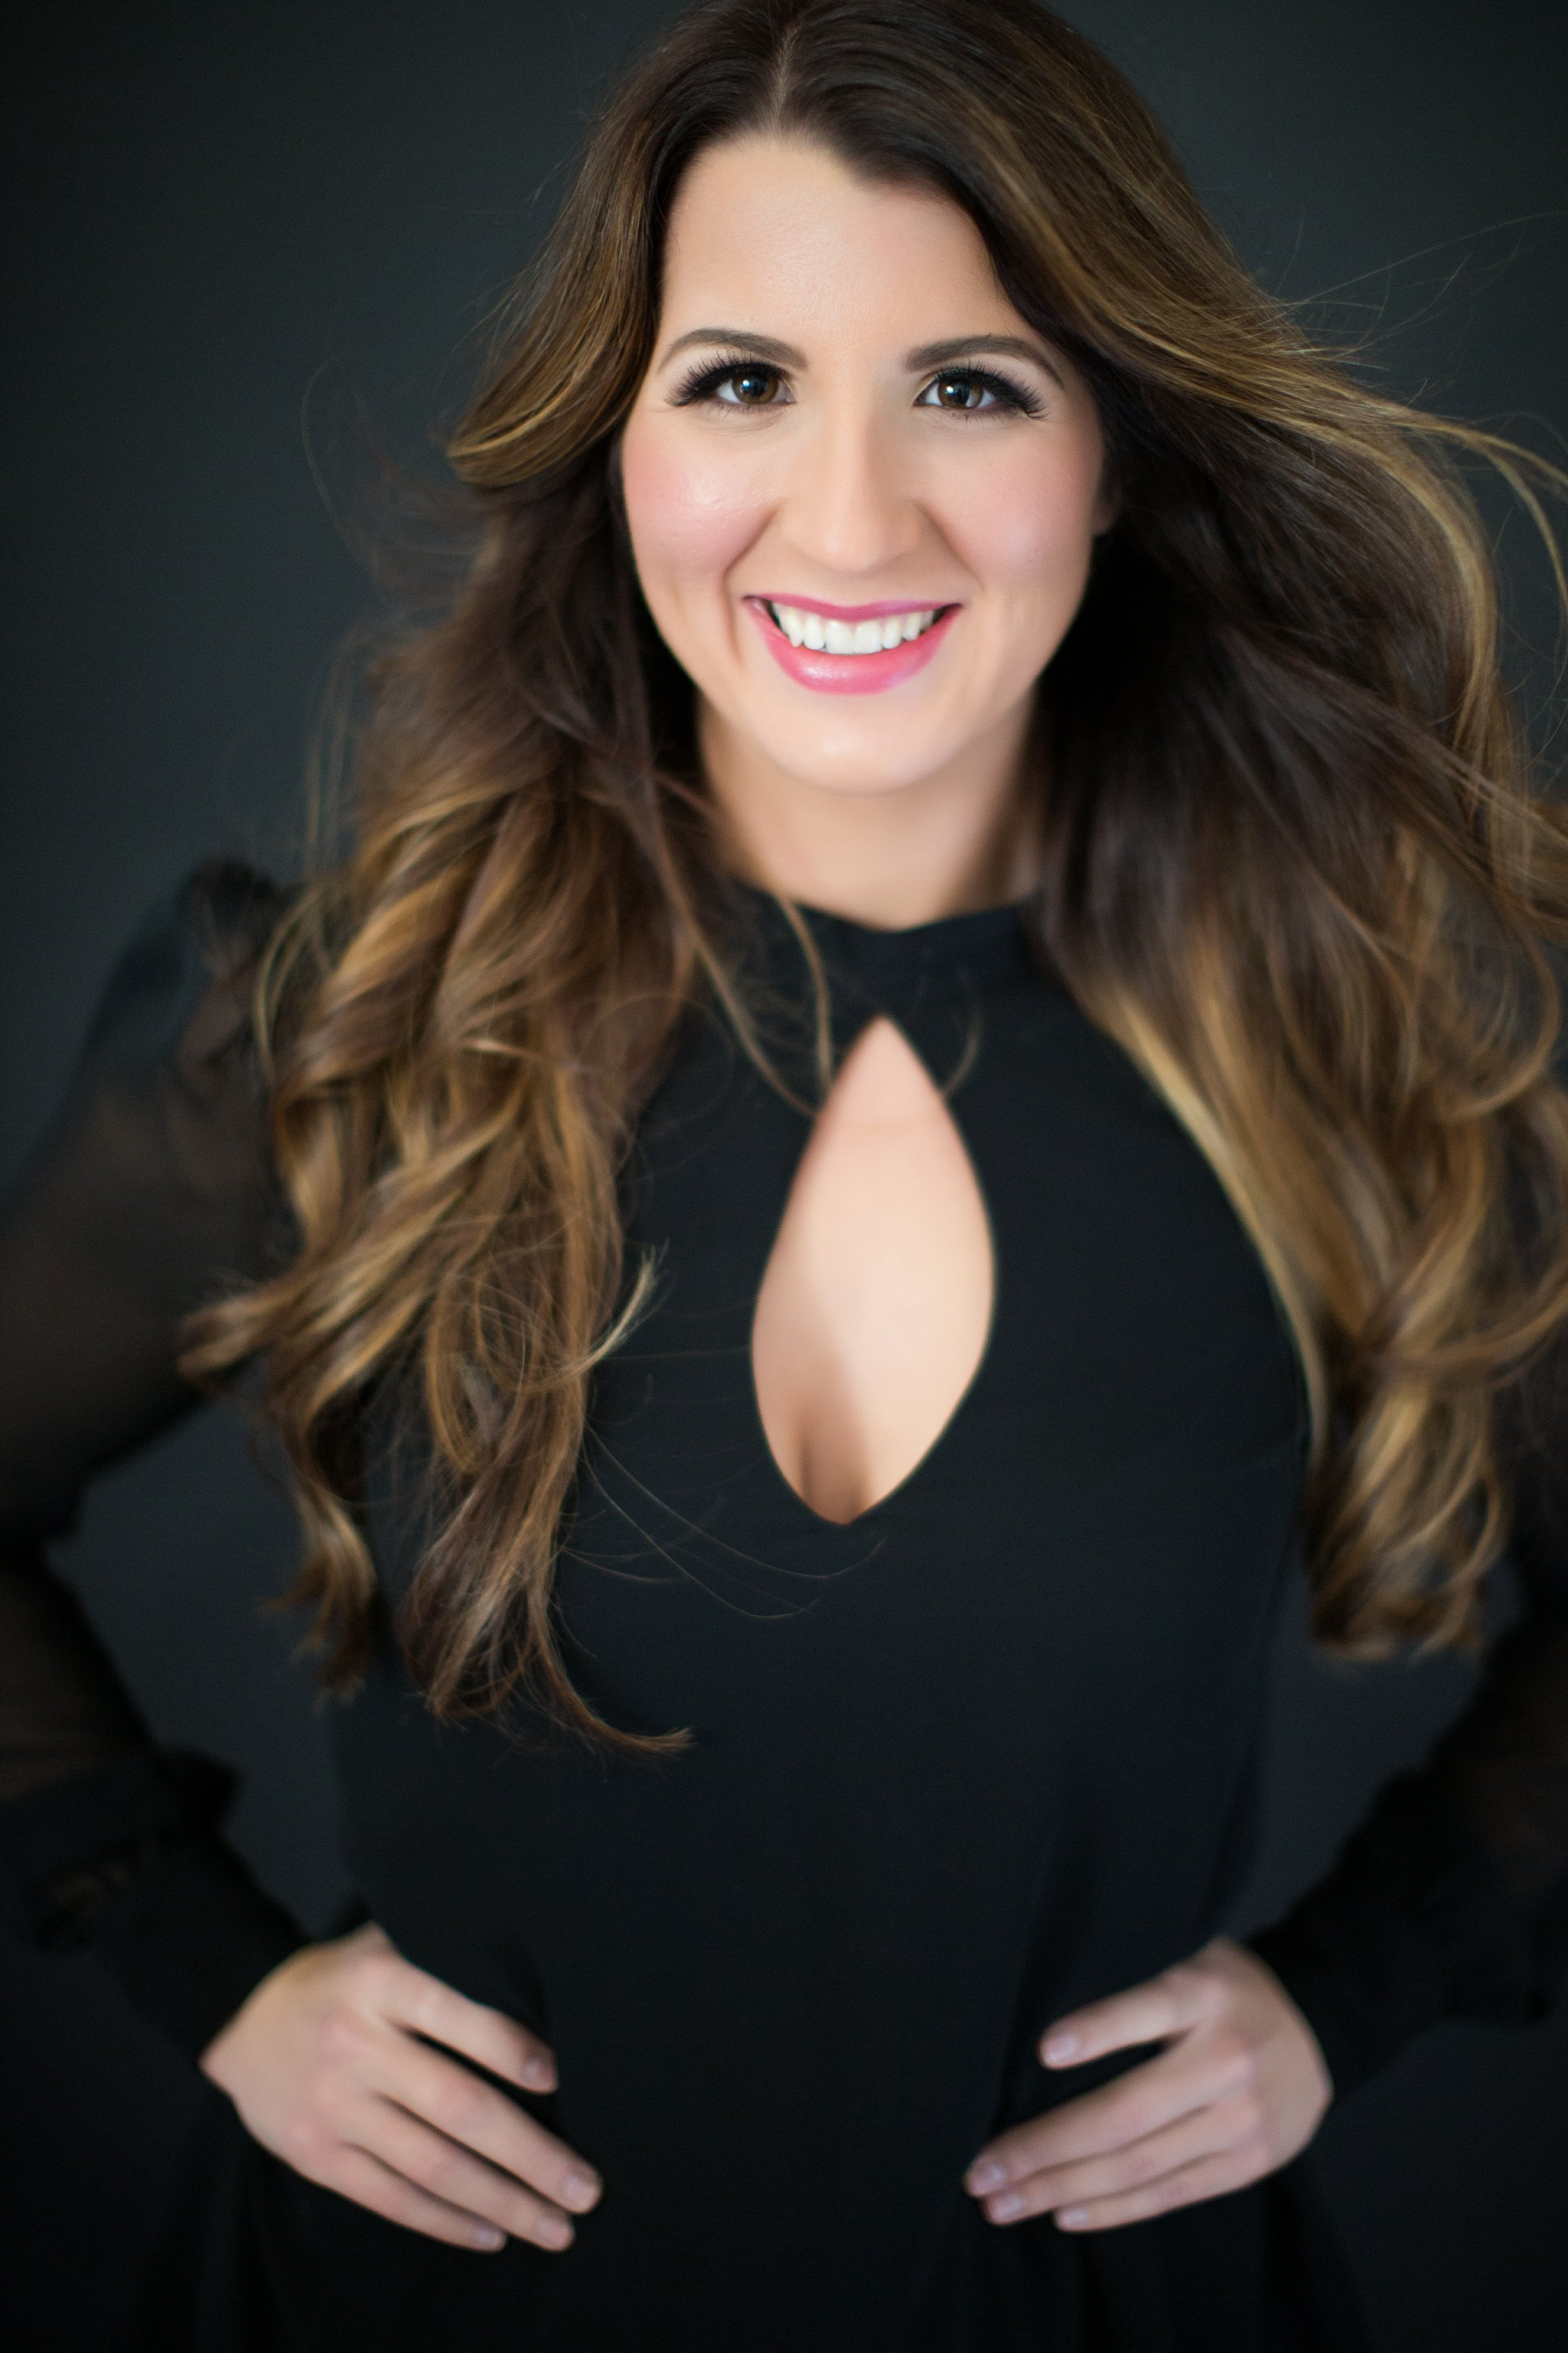 Rachel Girouard Photography - www.rachelgirouard.com